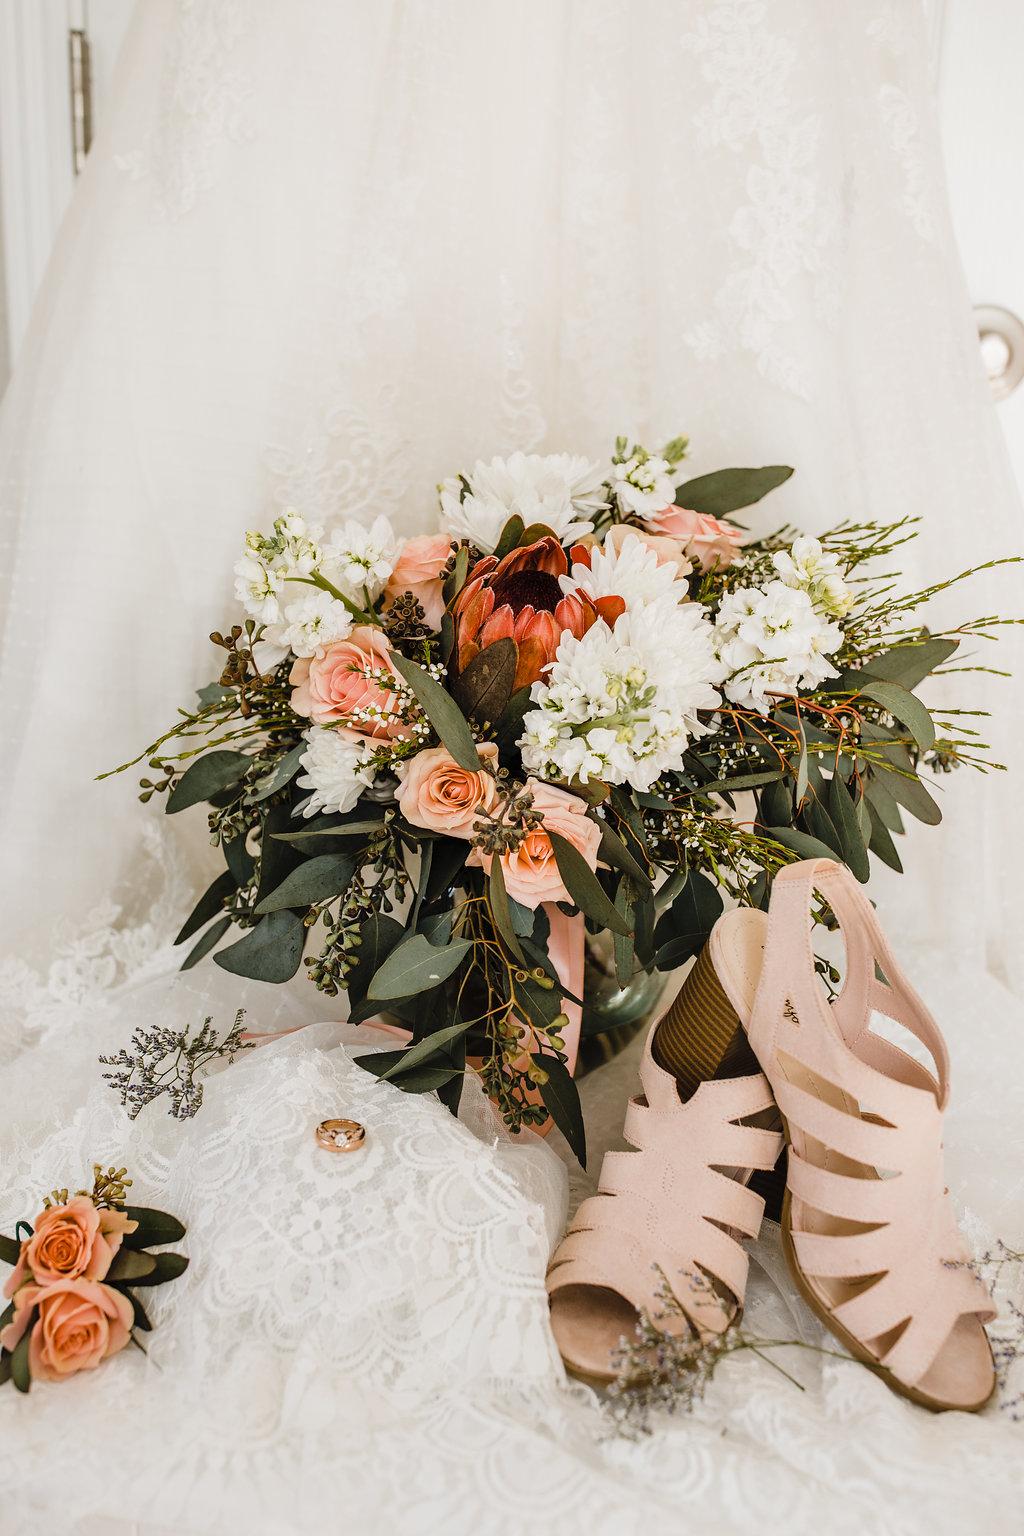 wedding day details bride sandals bouquet and ring professional utah wedding photographer calli richards